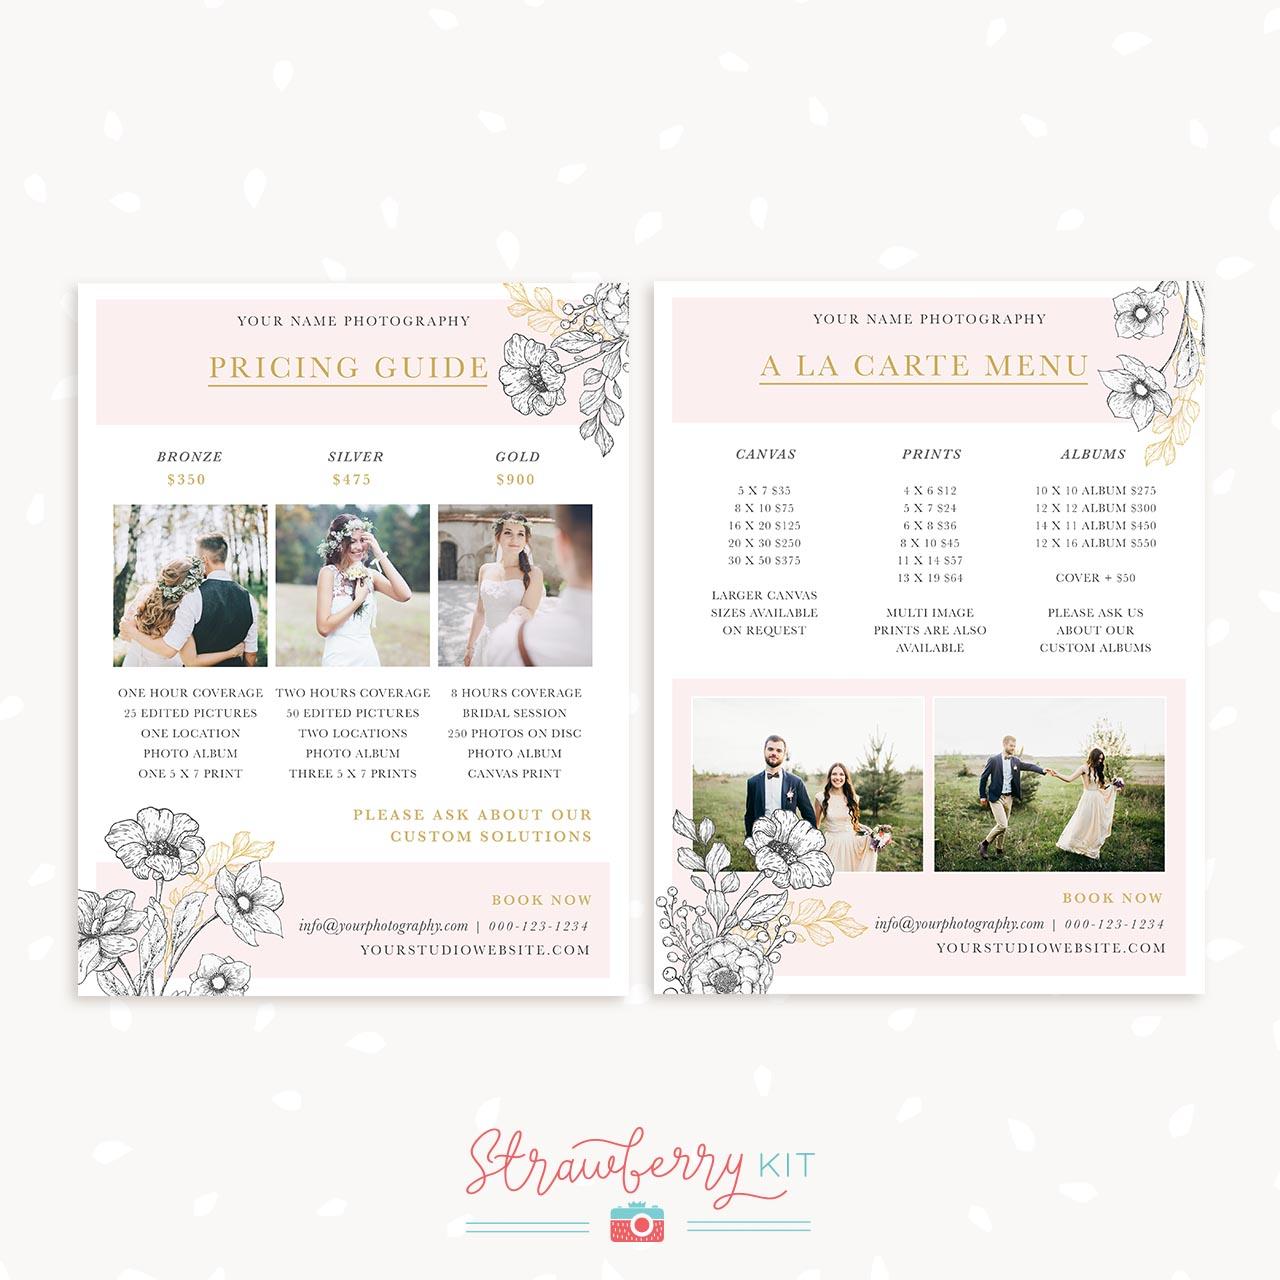 floral wedding price list template strawberry kit. Black Bedroom Furniture Sets. Home Design Ideas